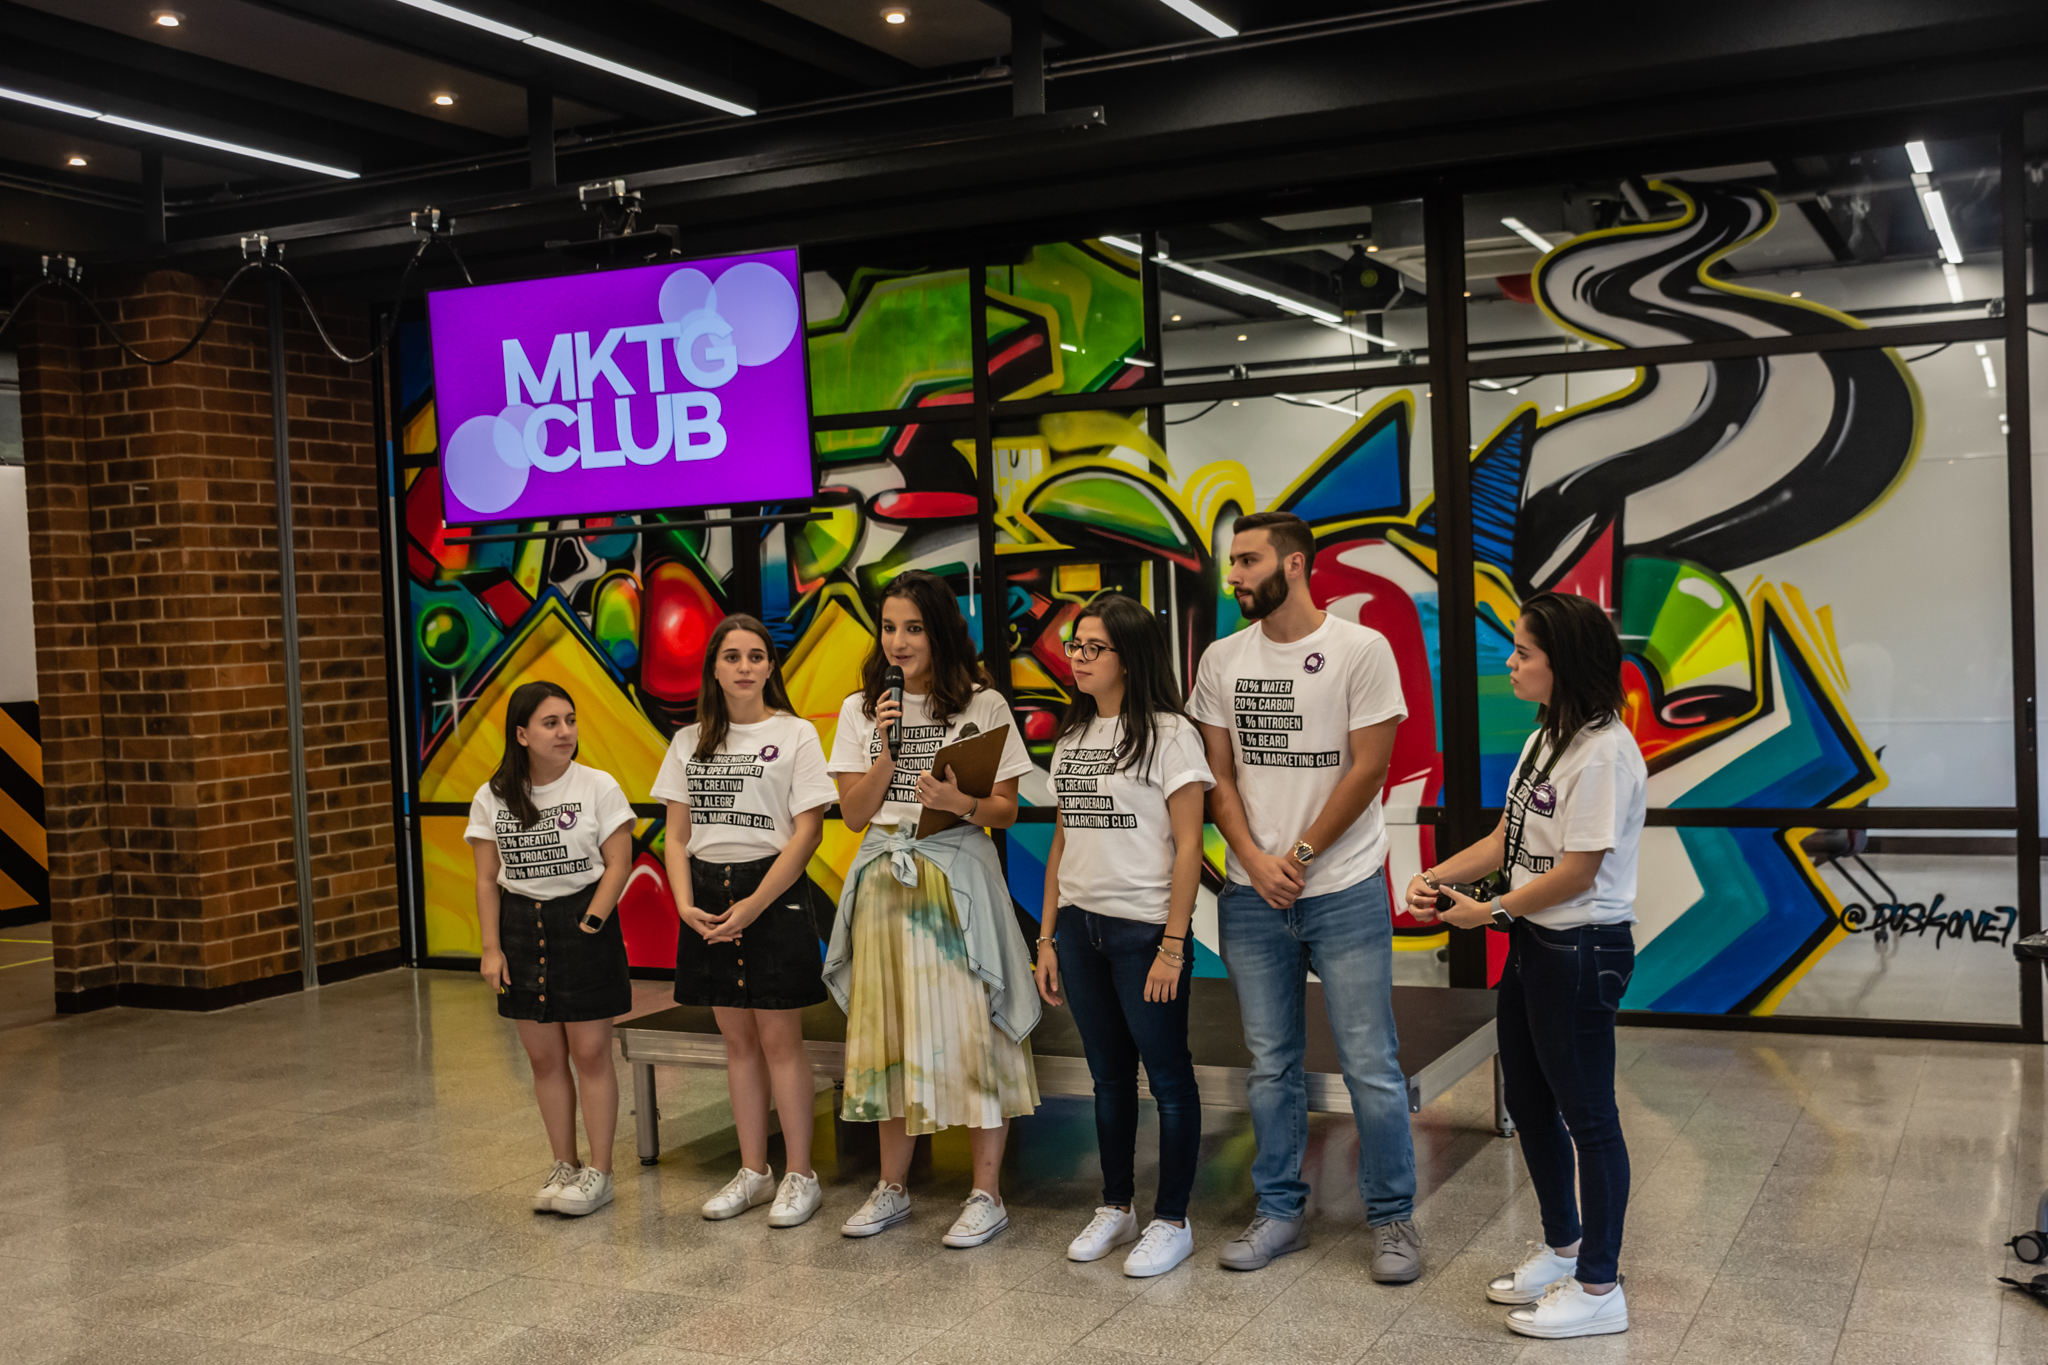 MKTG CLUB 2